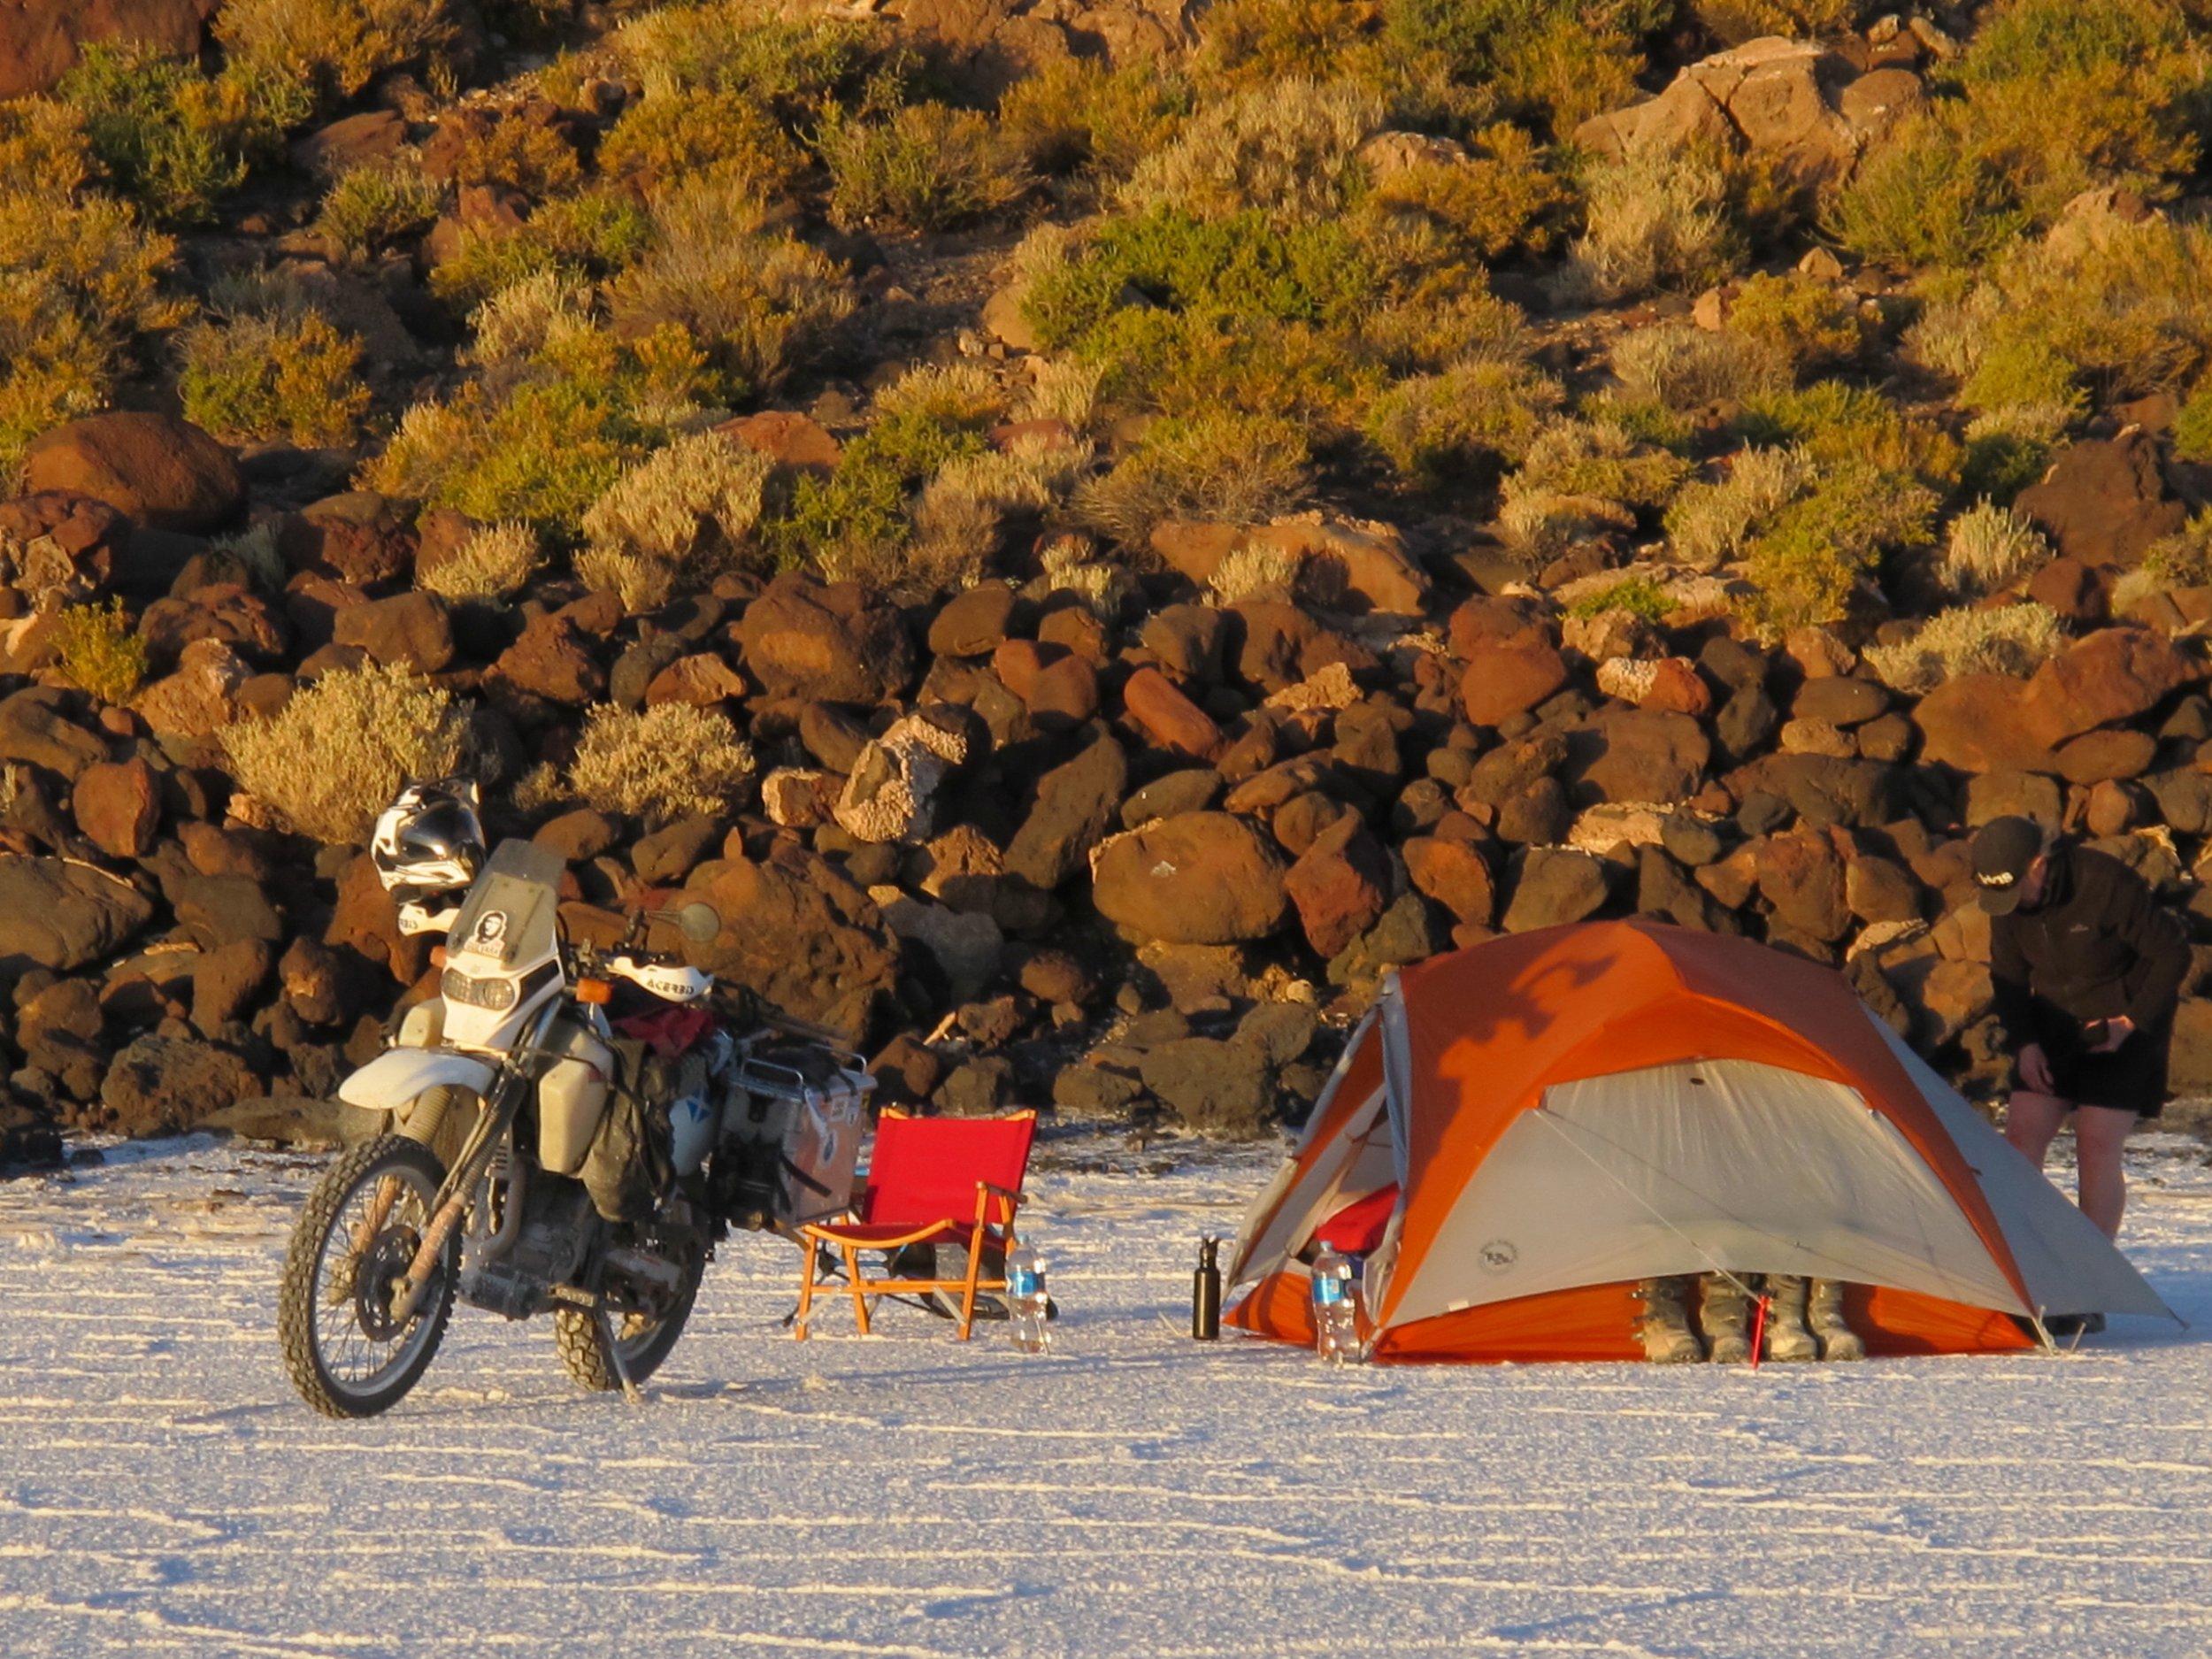 Camping beside Isla Incahuassi, Salar de Uyuni, Bolivia